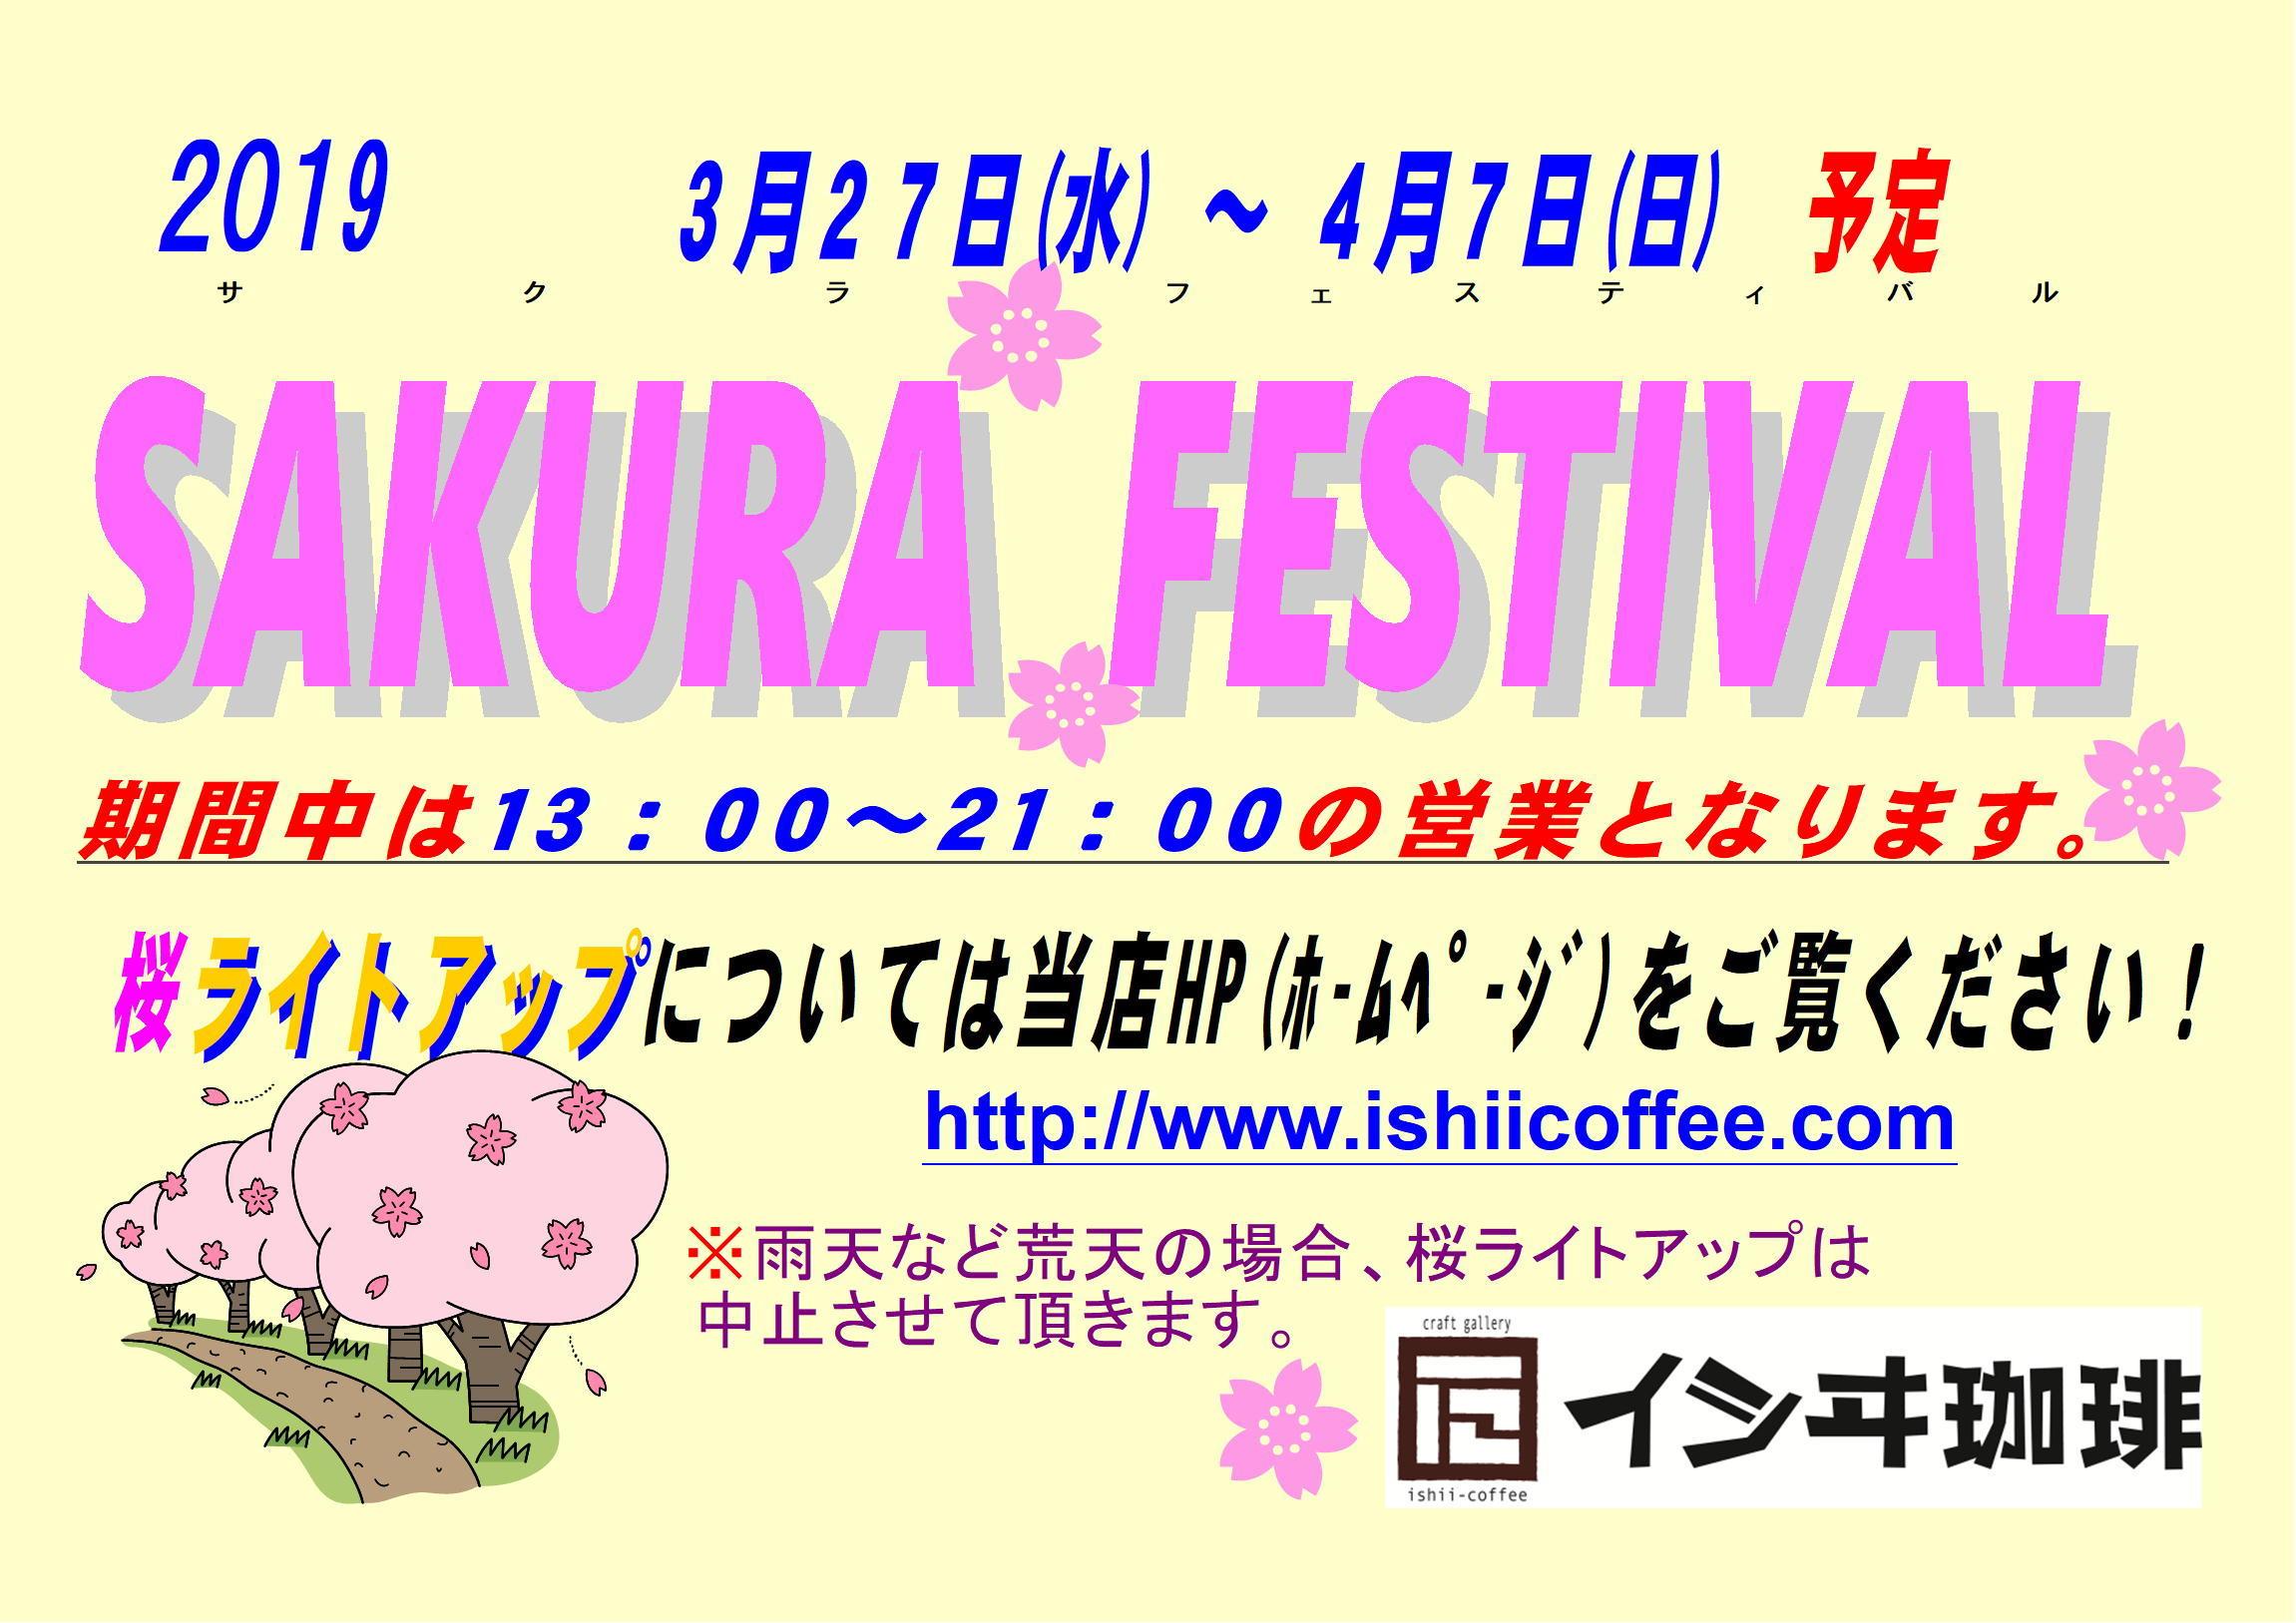 SAKURA FESTIVAL 2019 のお知らせ_d0237446_16594576.jpg